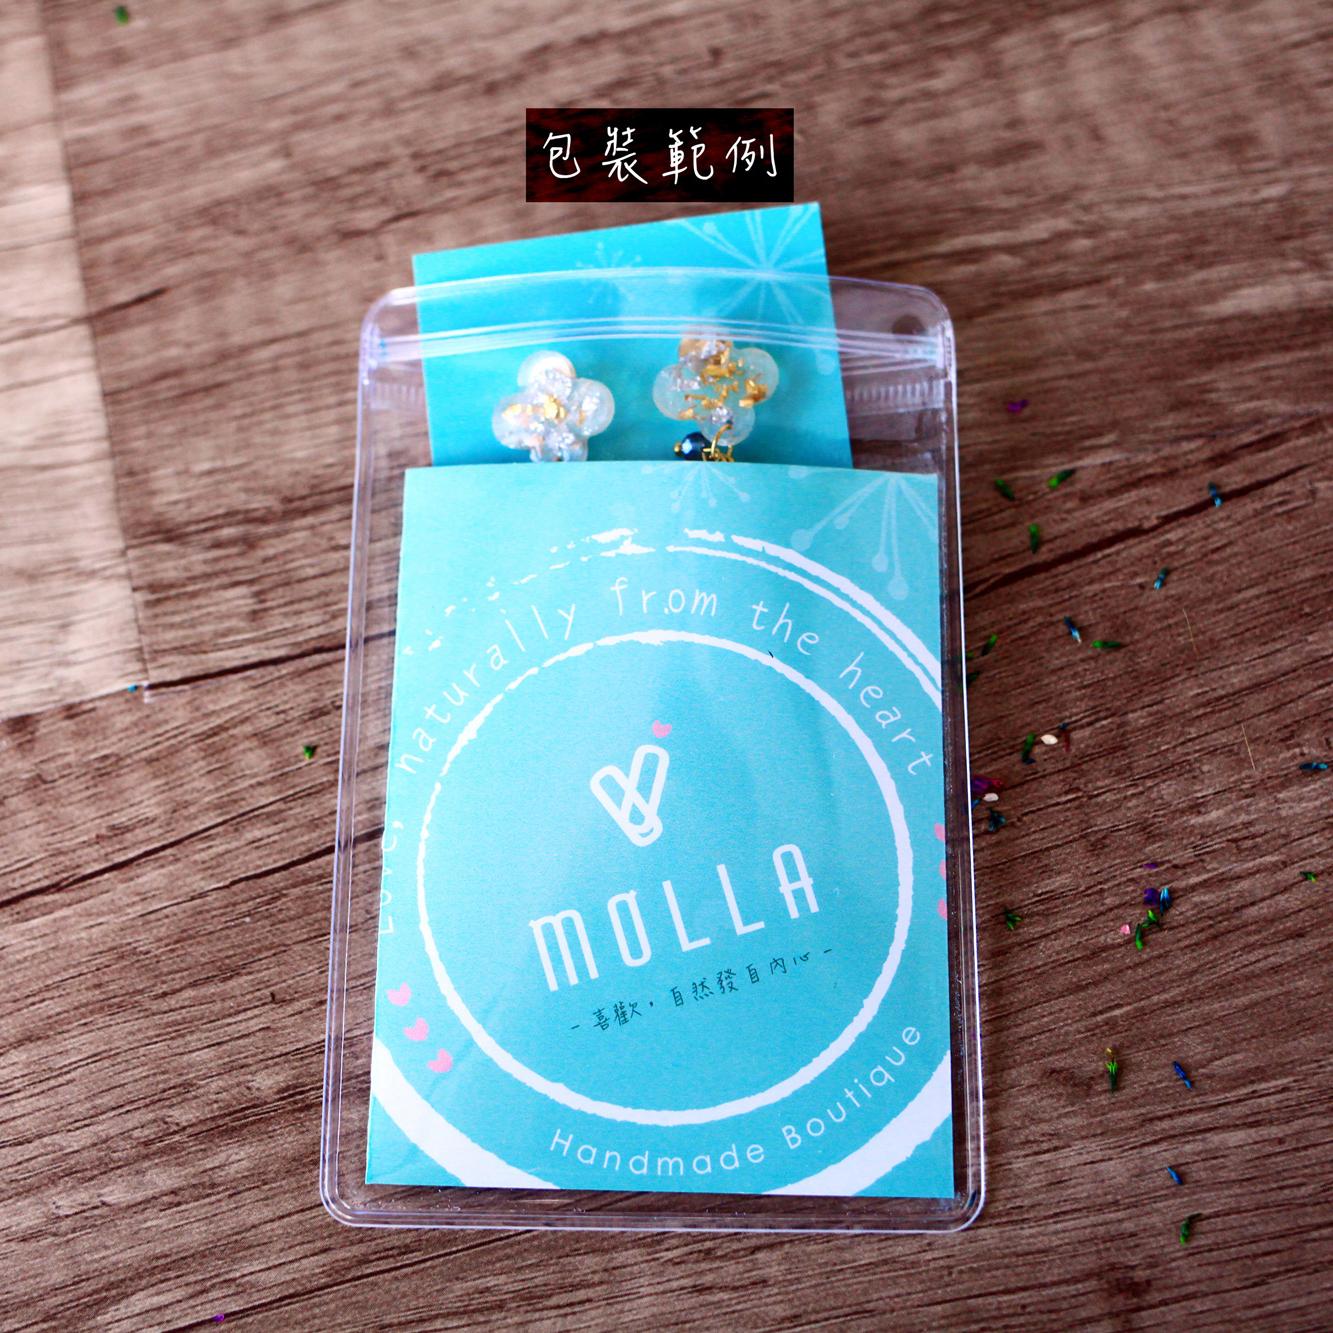 Molla 搖搖小木馬耳環(純銀針耳環-手工訂製)